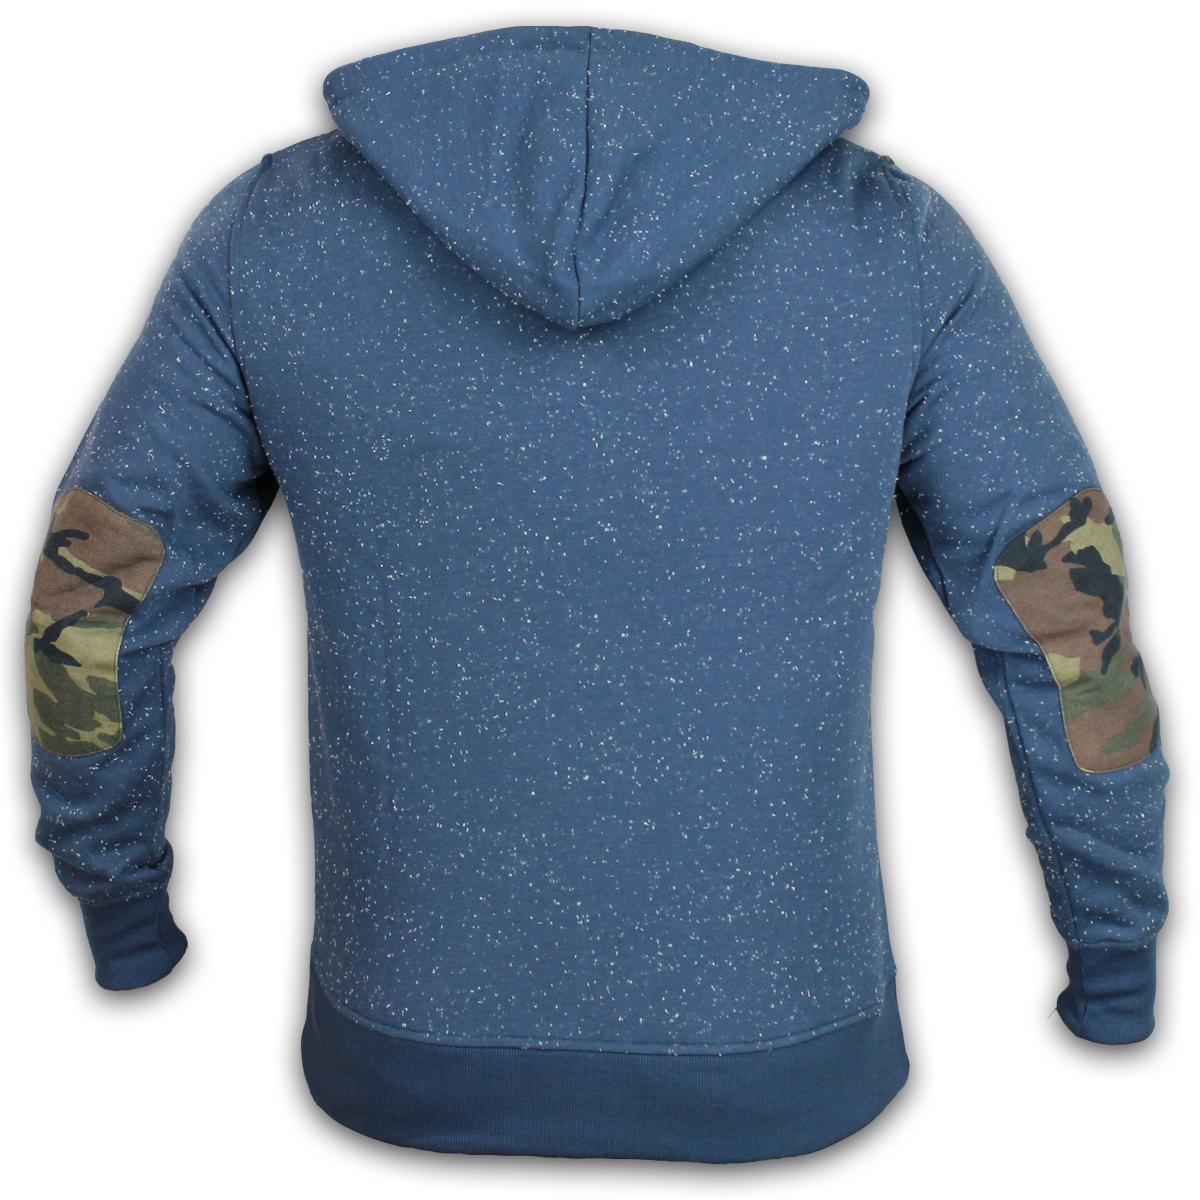 Boys Kangol Hoody Sweatshirt Camouflage Marl Patches Neppy Fleece Designer New